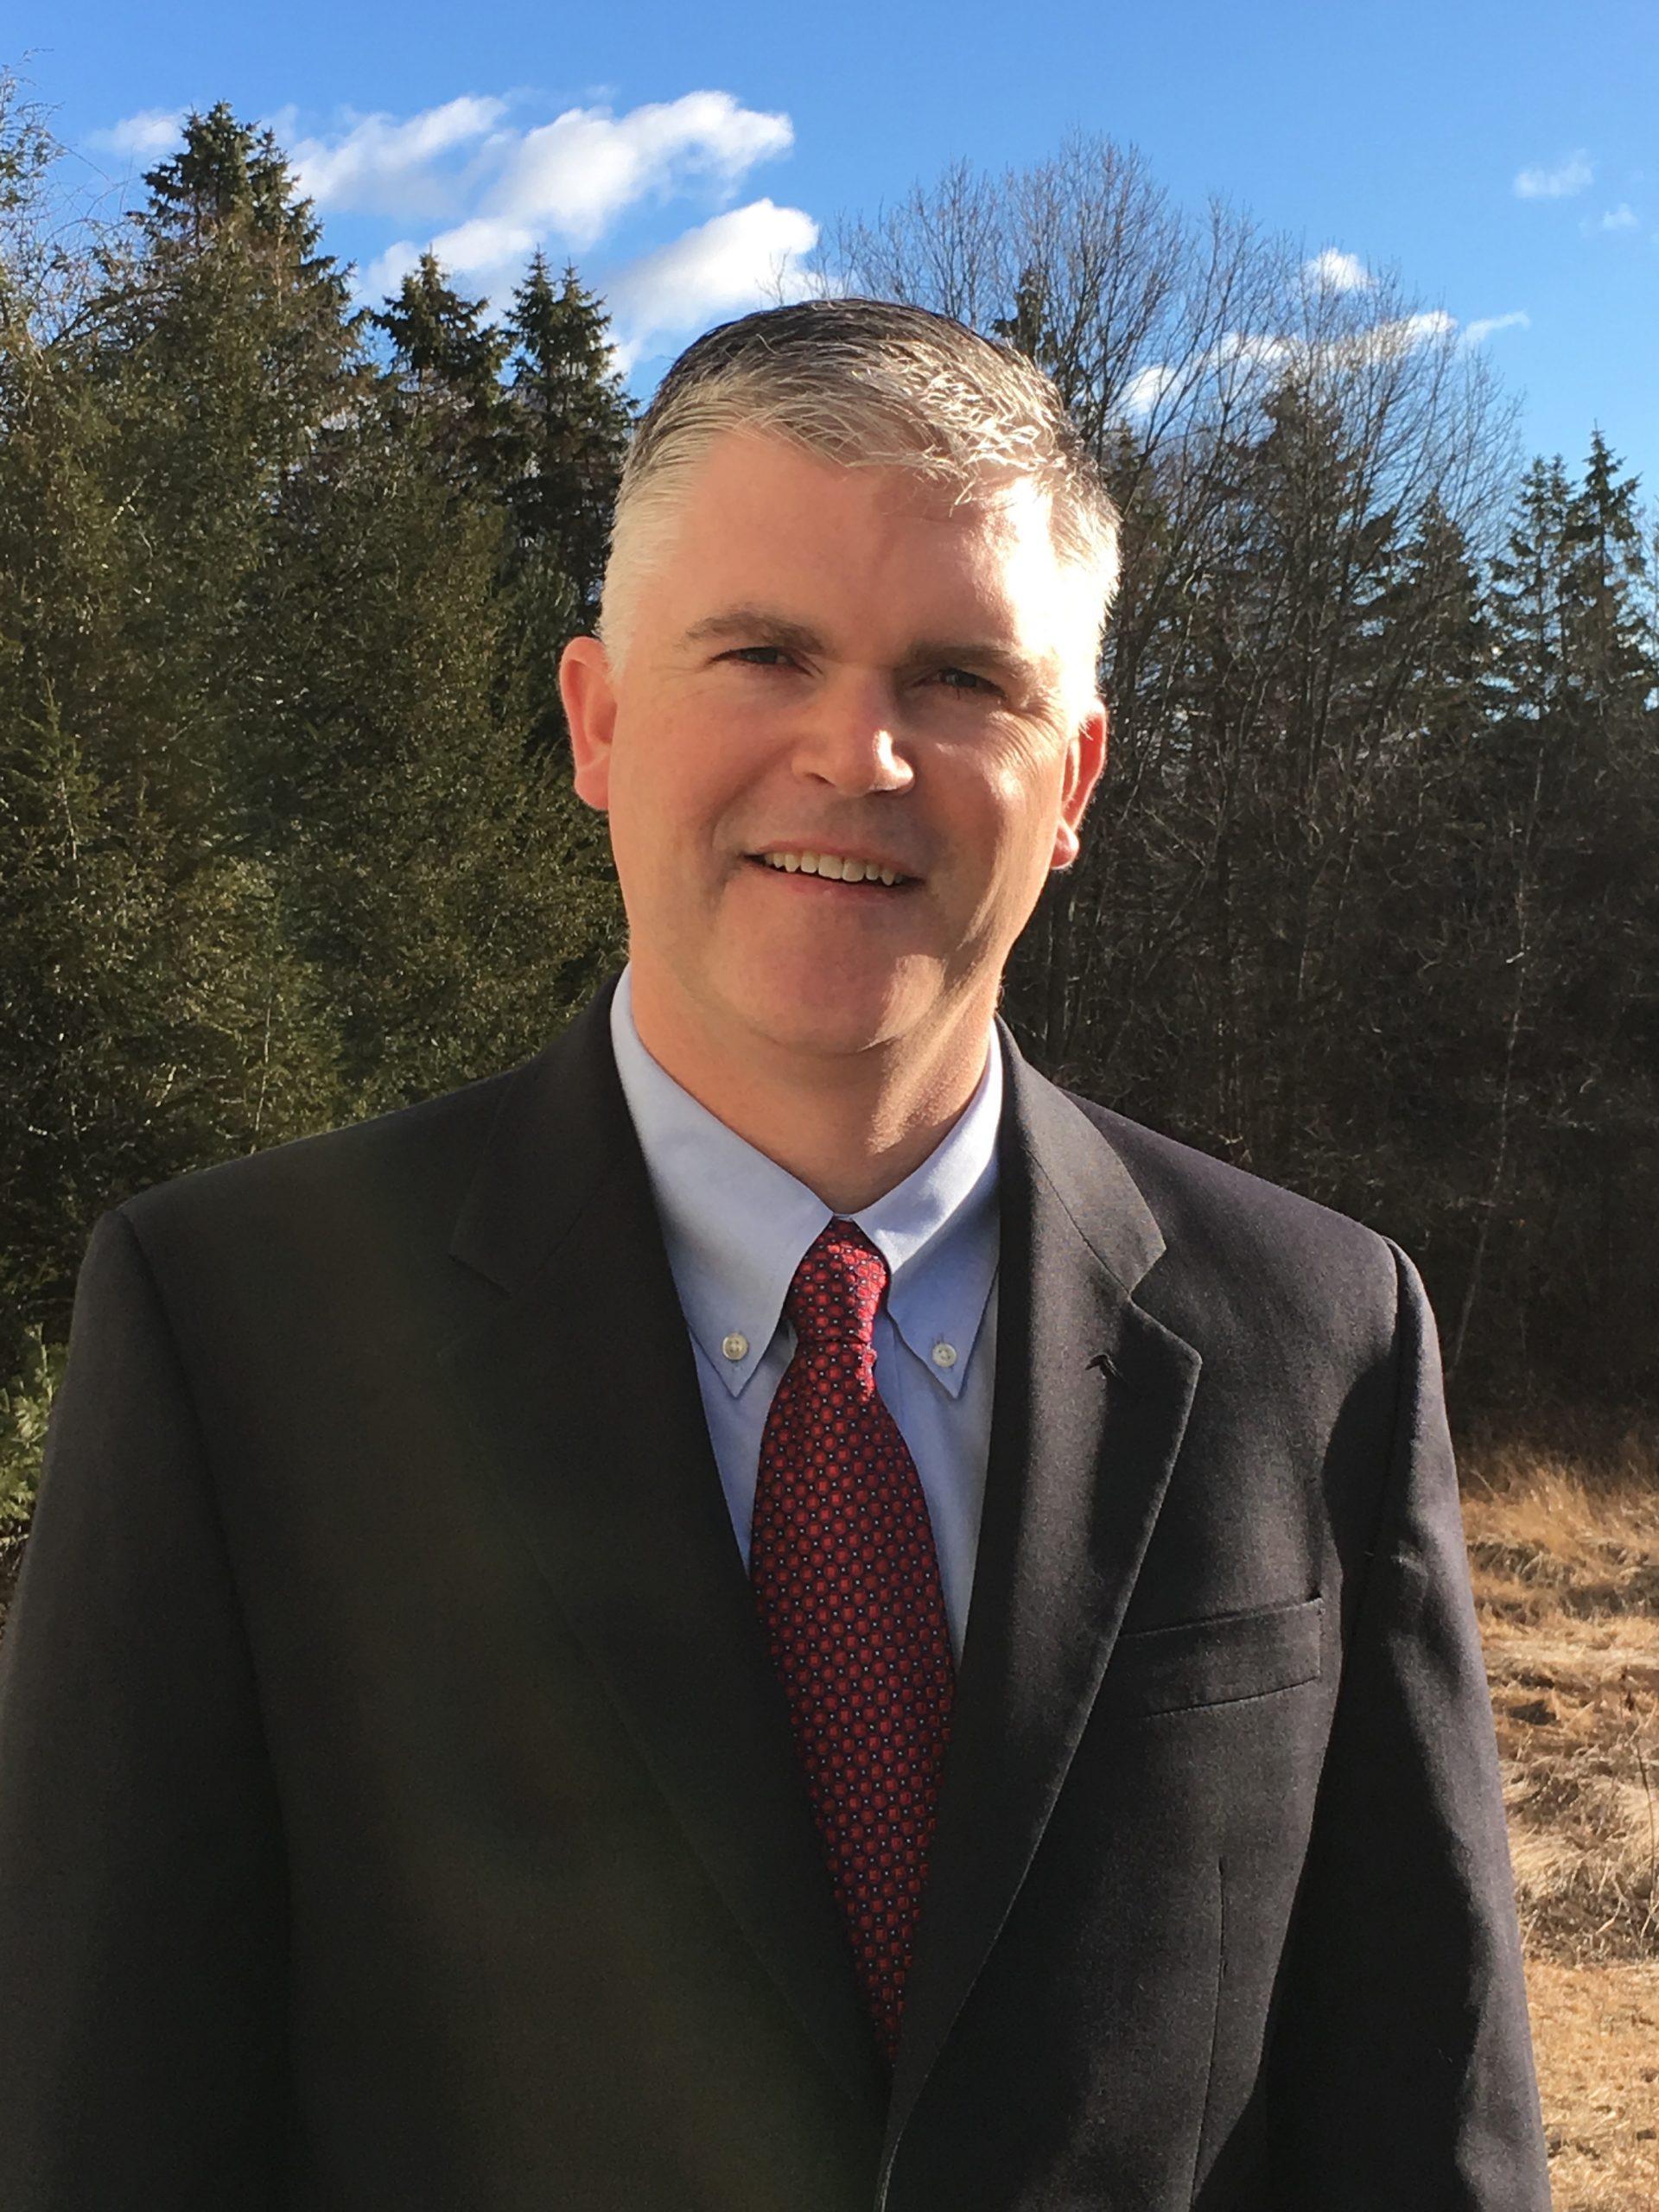 Brian Gibbs Alliance Tire Americas